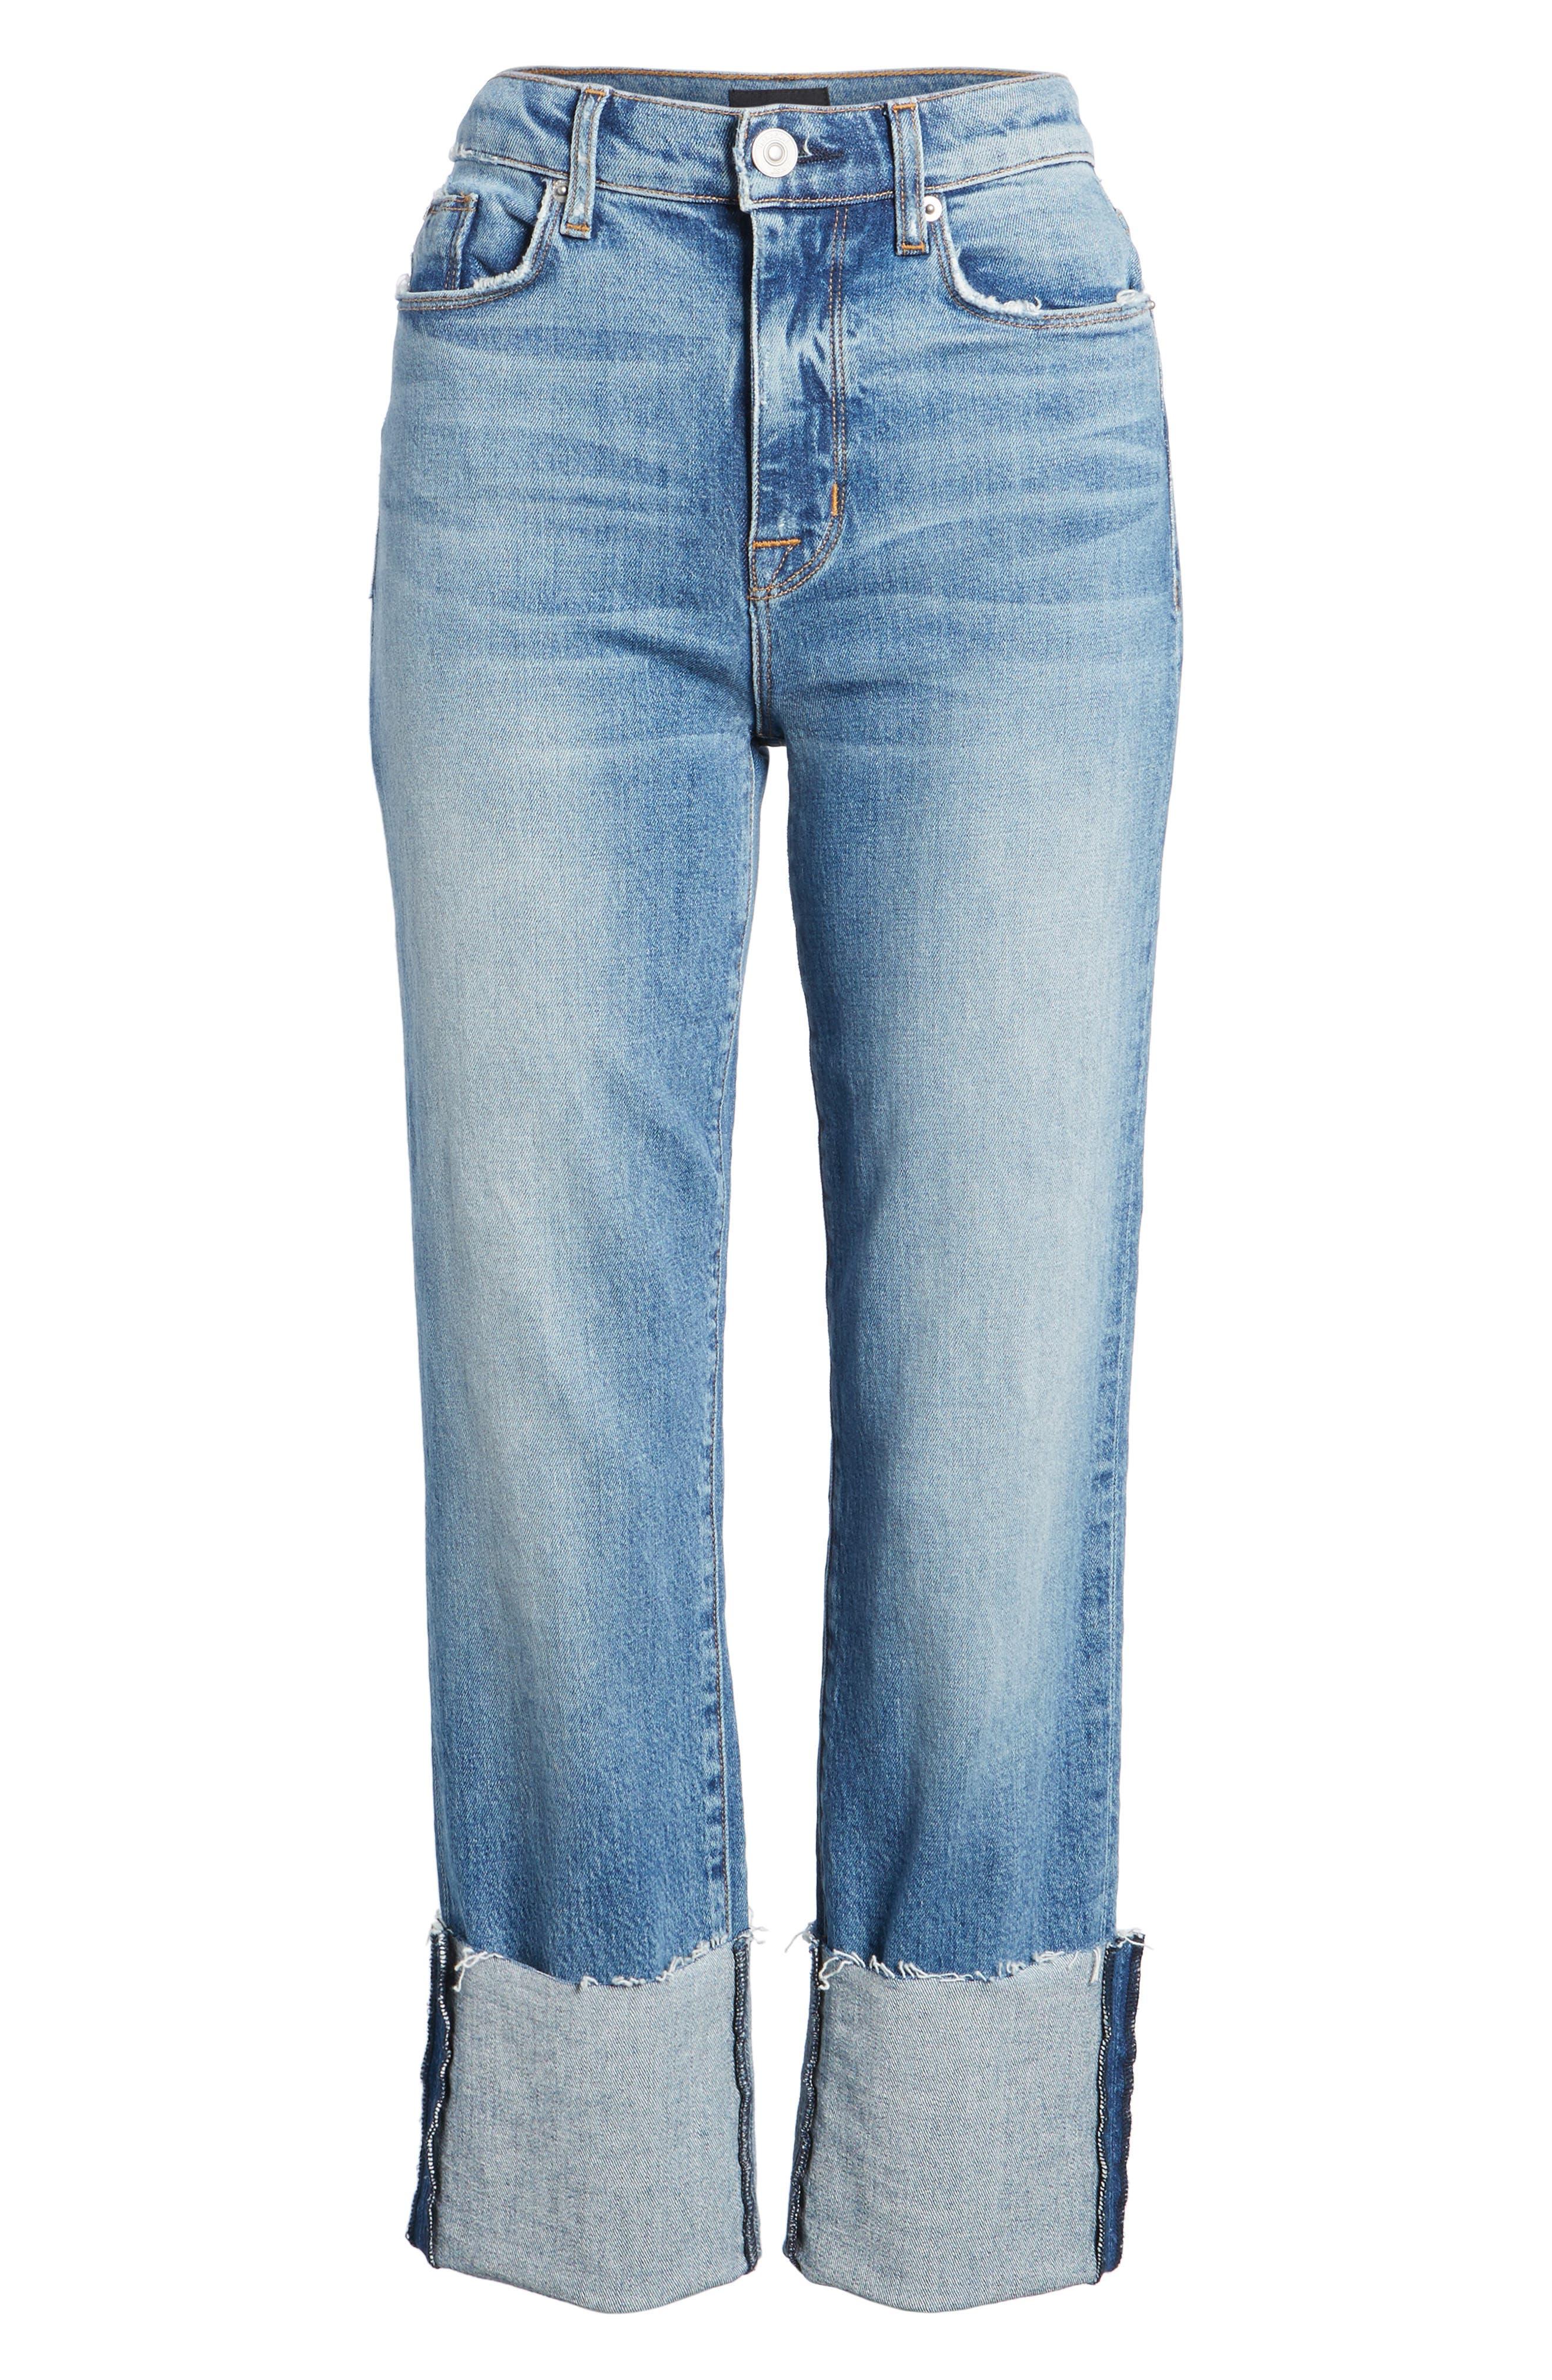 Zoeey High Waist Crop Straight Leg Jeans,                             Alternate thumbnail 18, color,